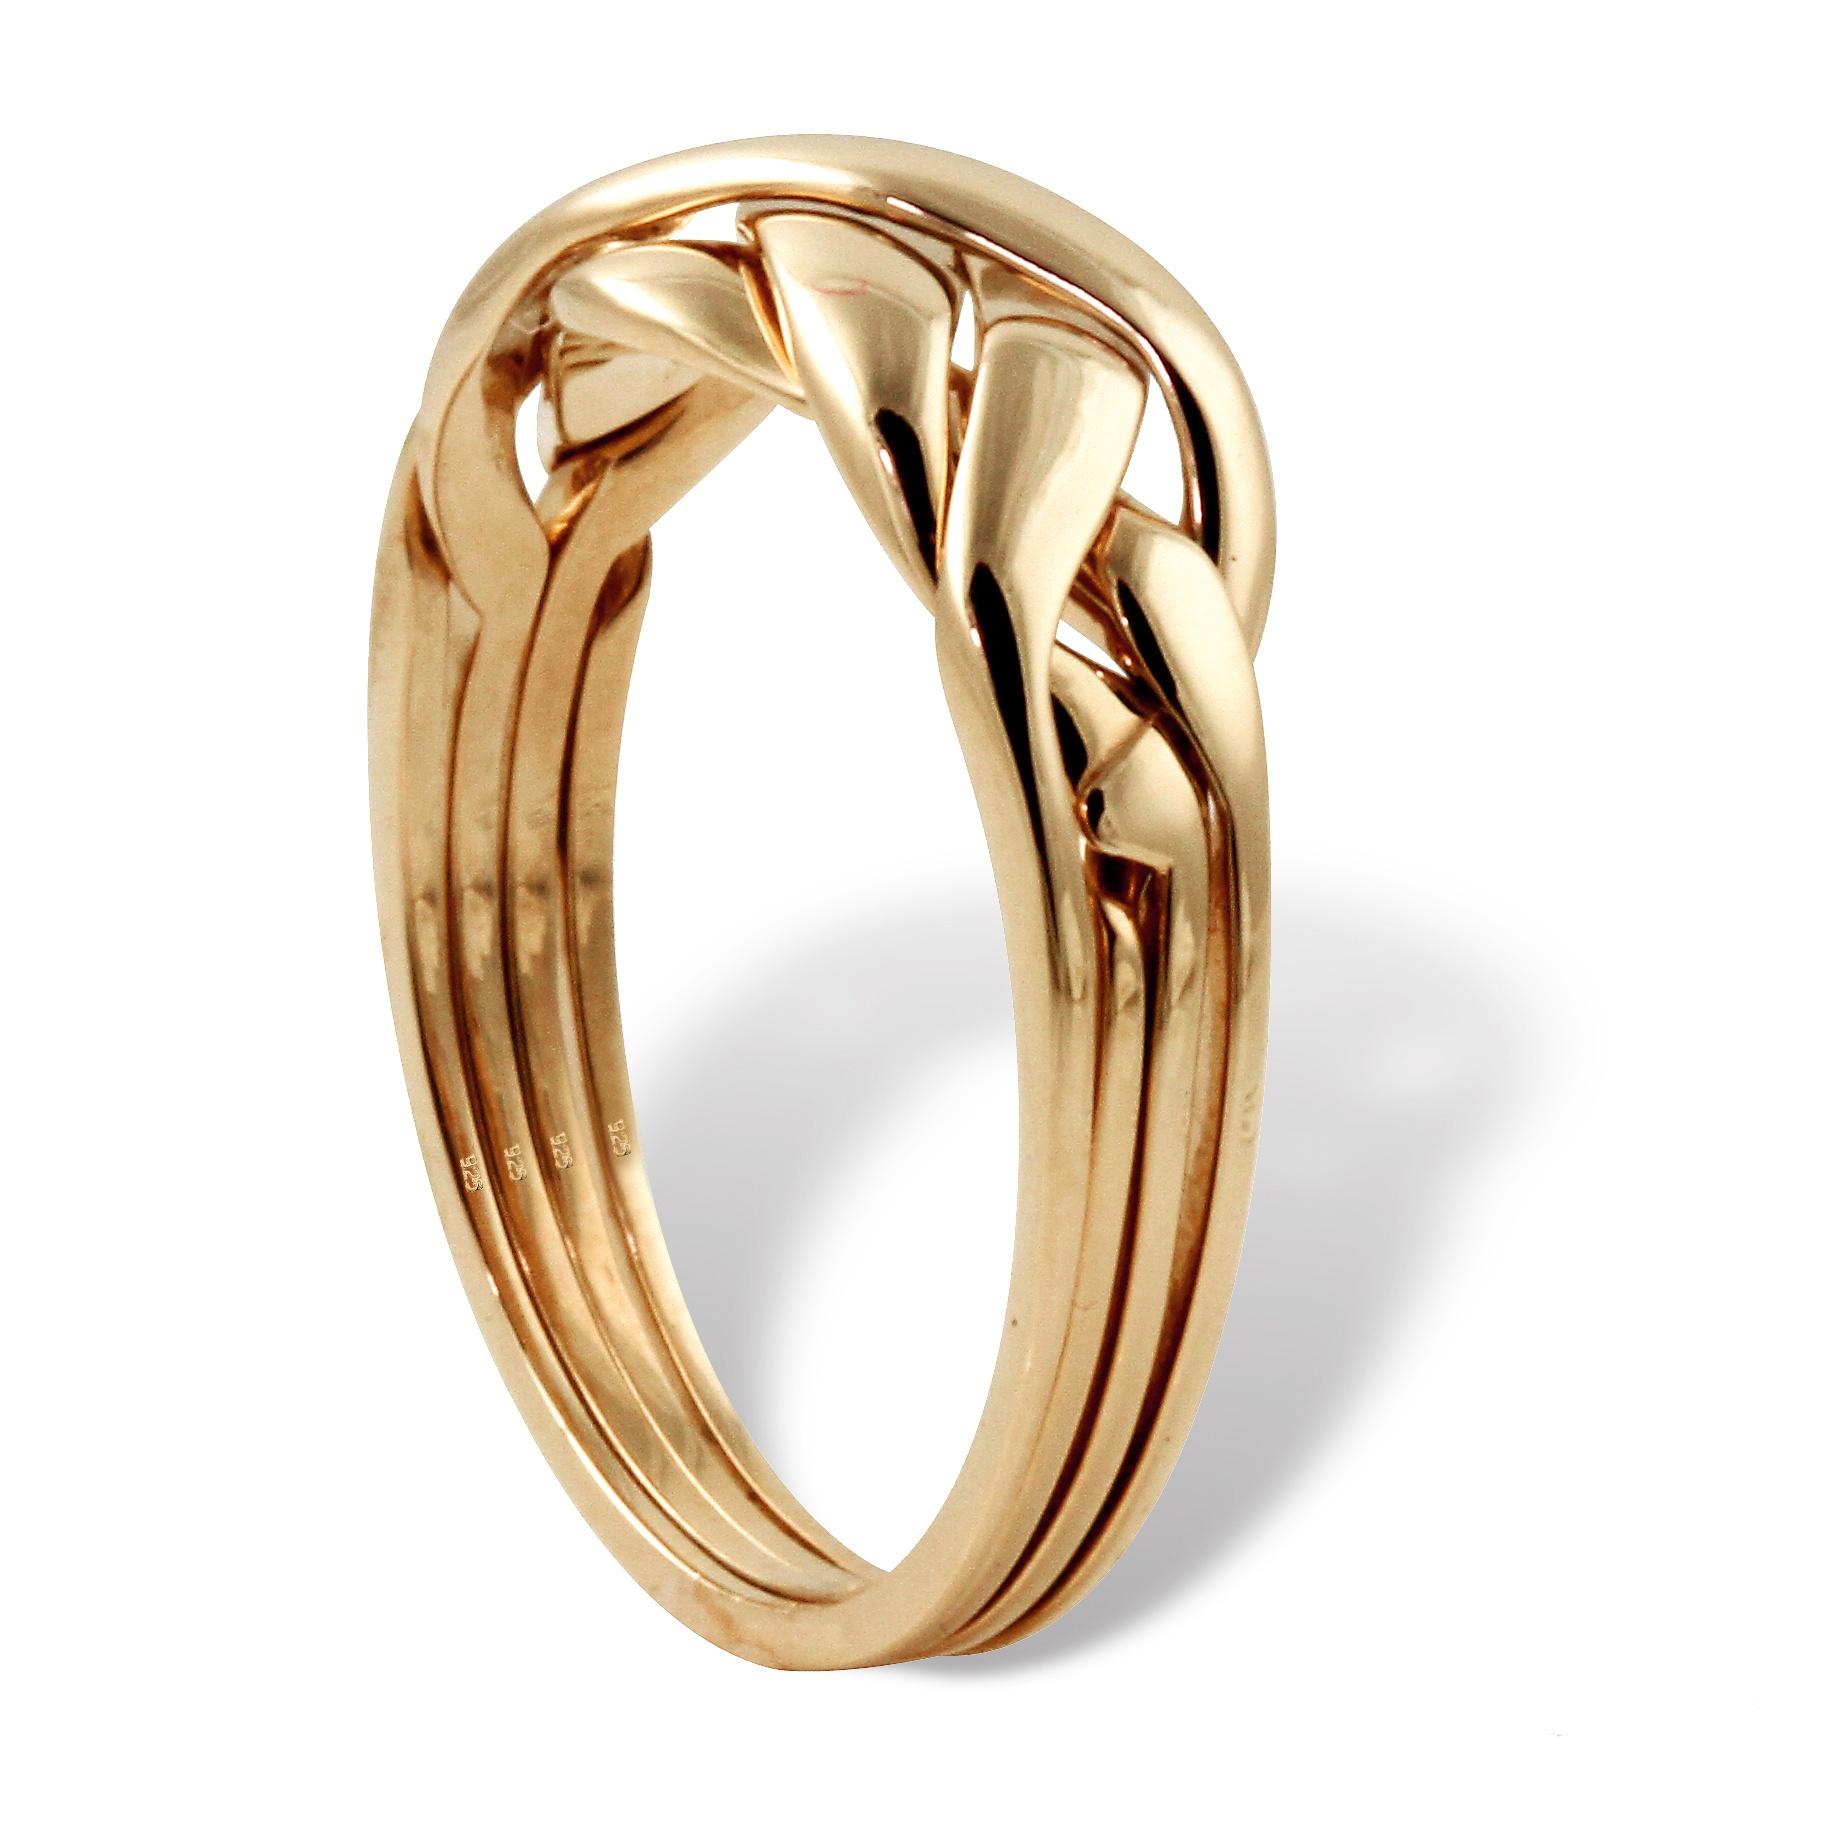 palmbeach jewelry 18k yellow gold 925 sterling silver